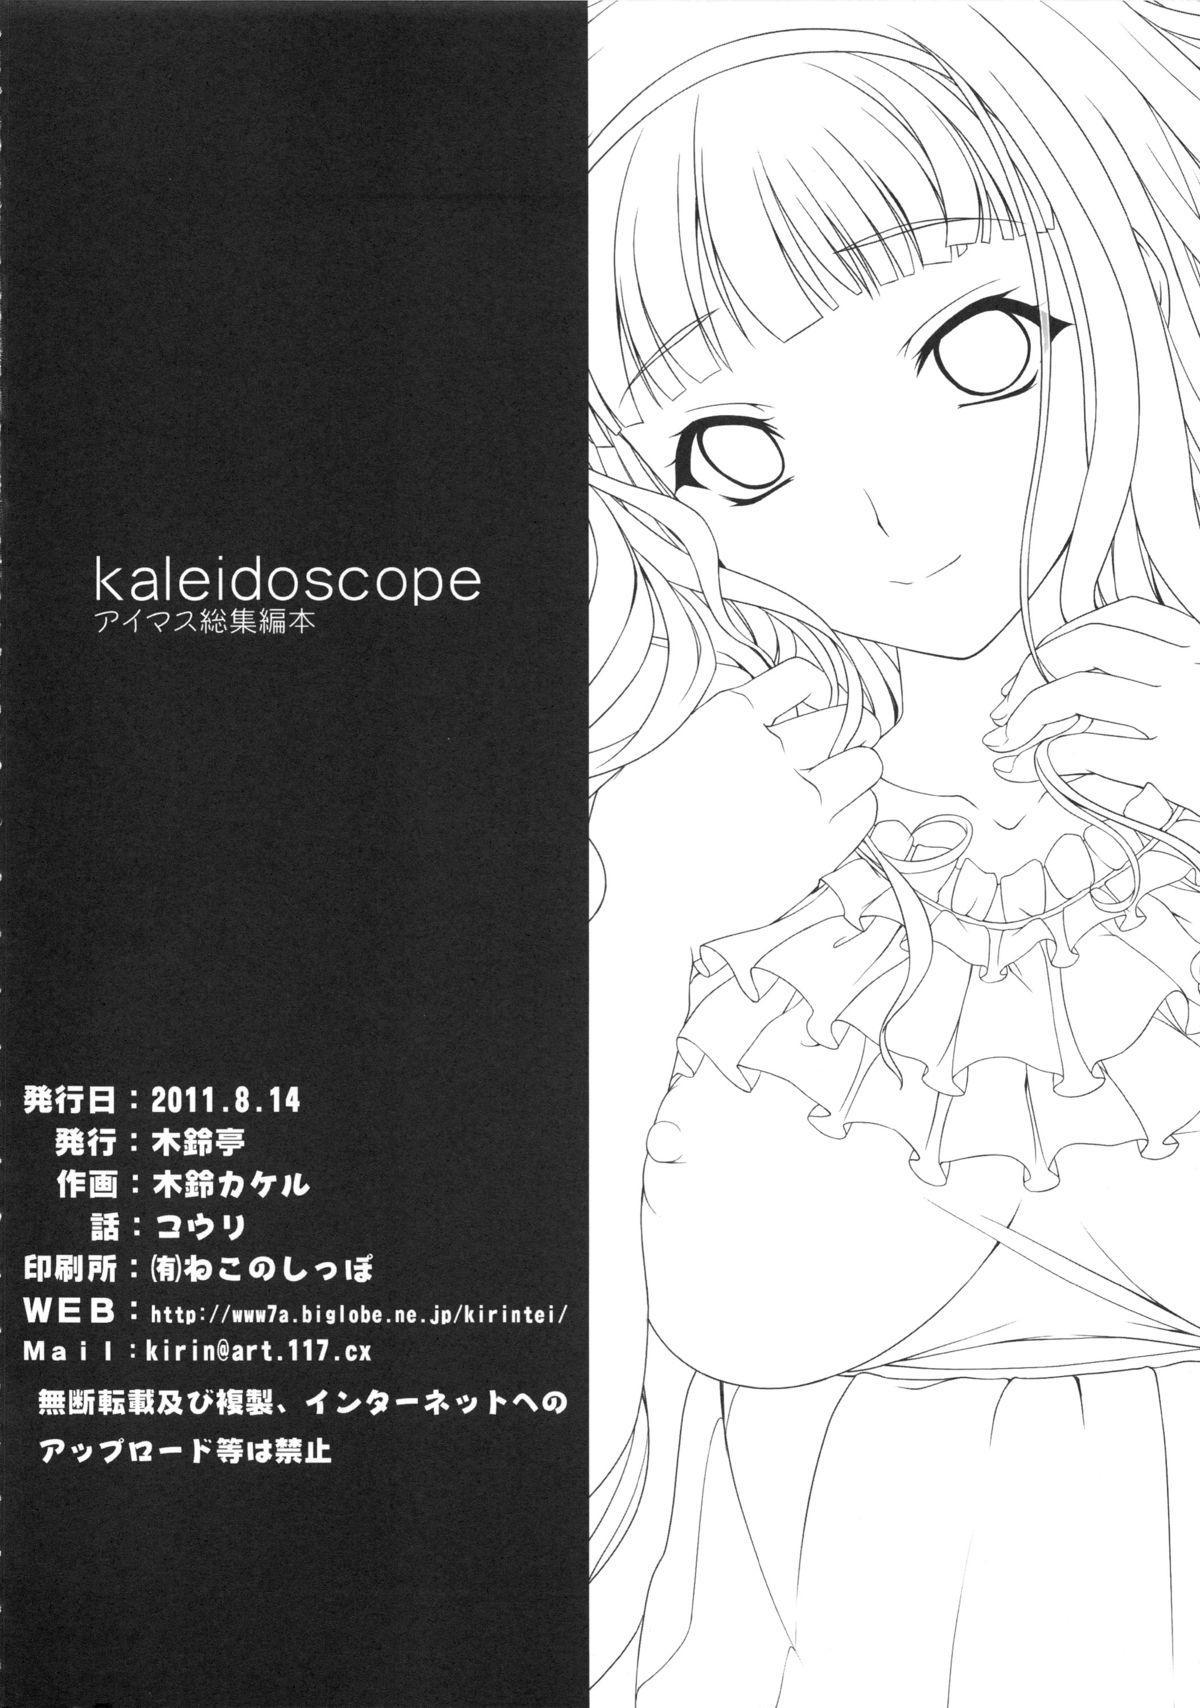 kaleidoscope ~kirintei imas complete Best~ 142